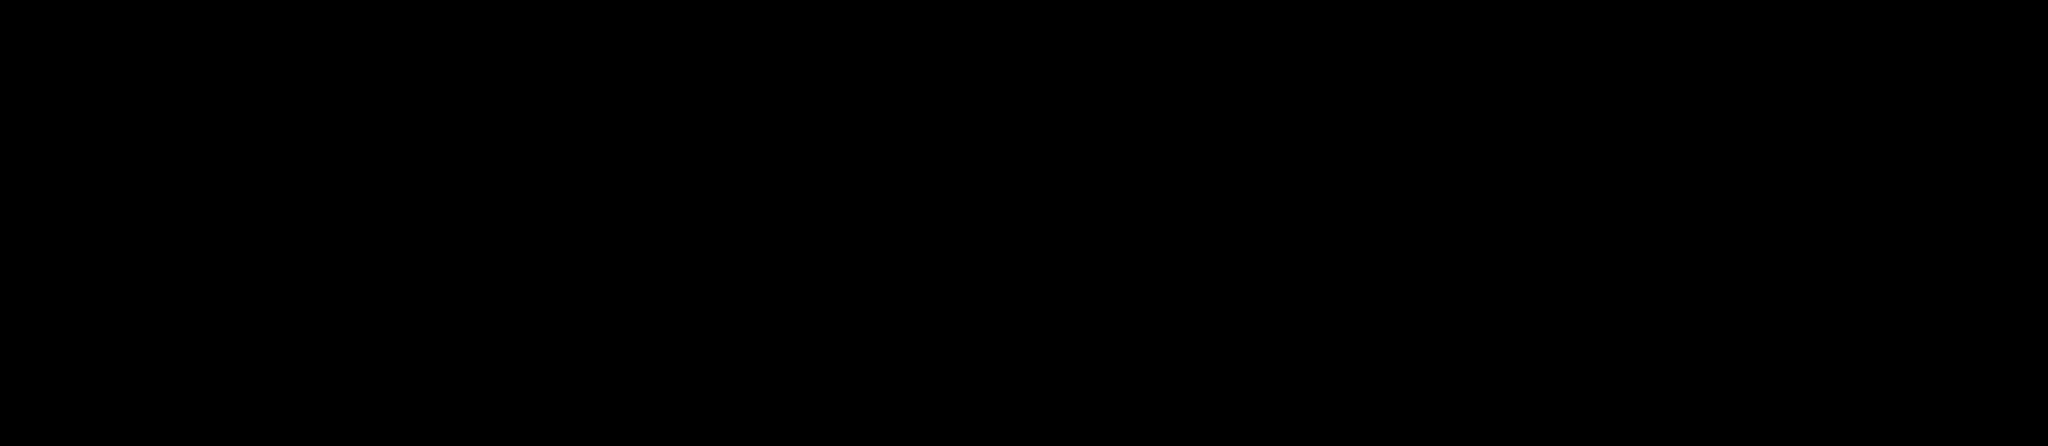 Daniel Haveman - logo2019